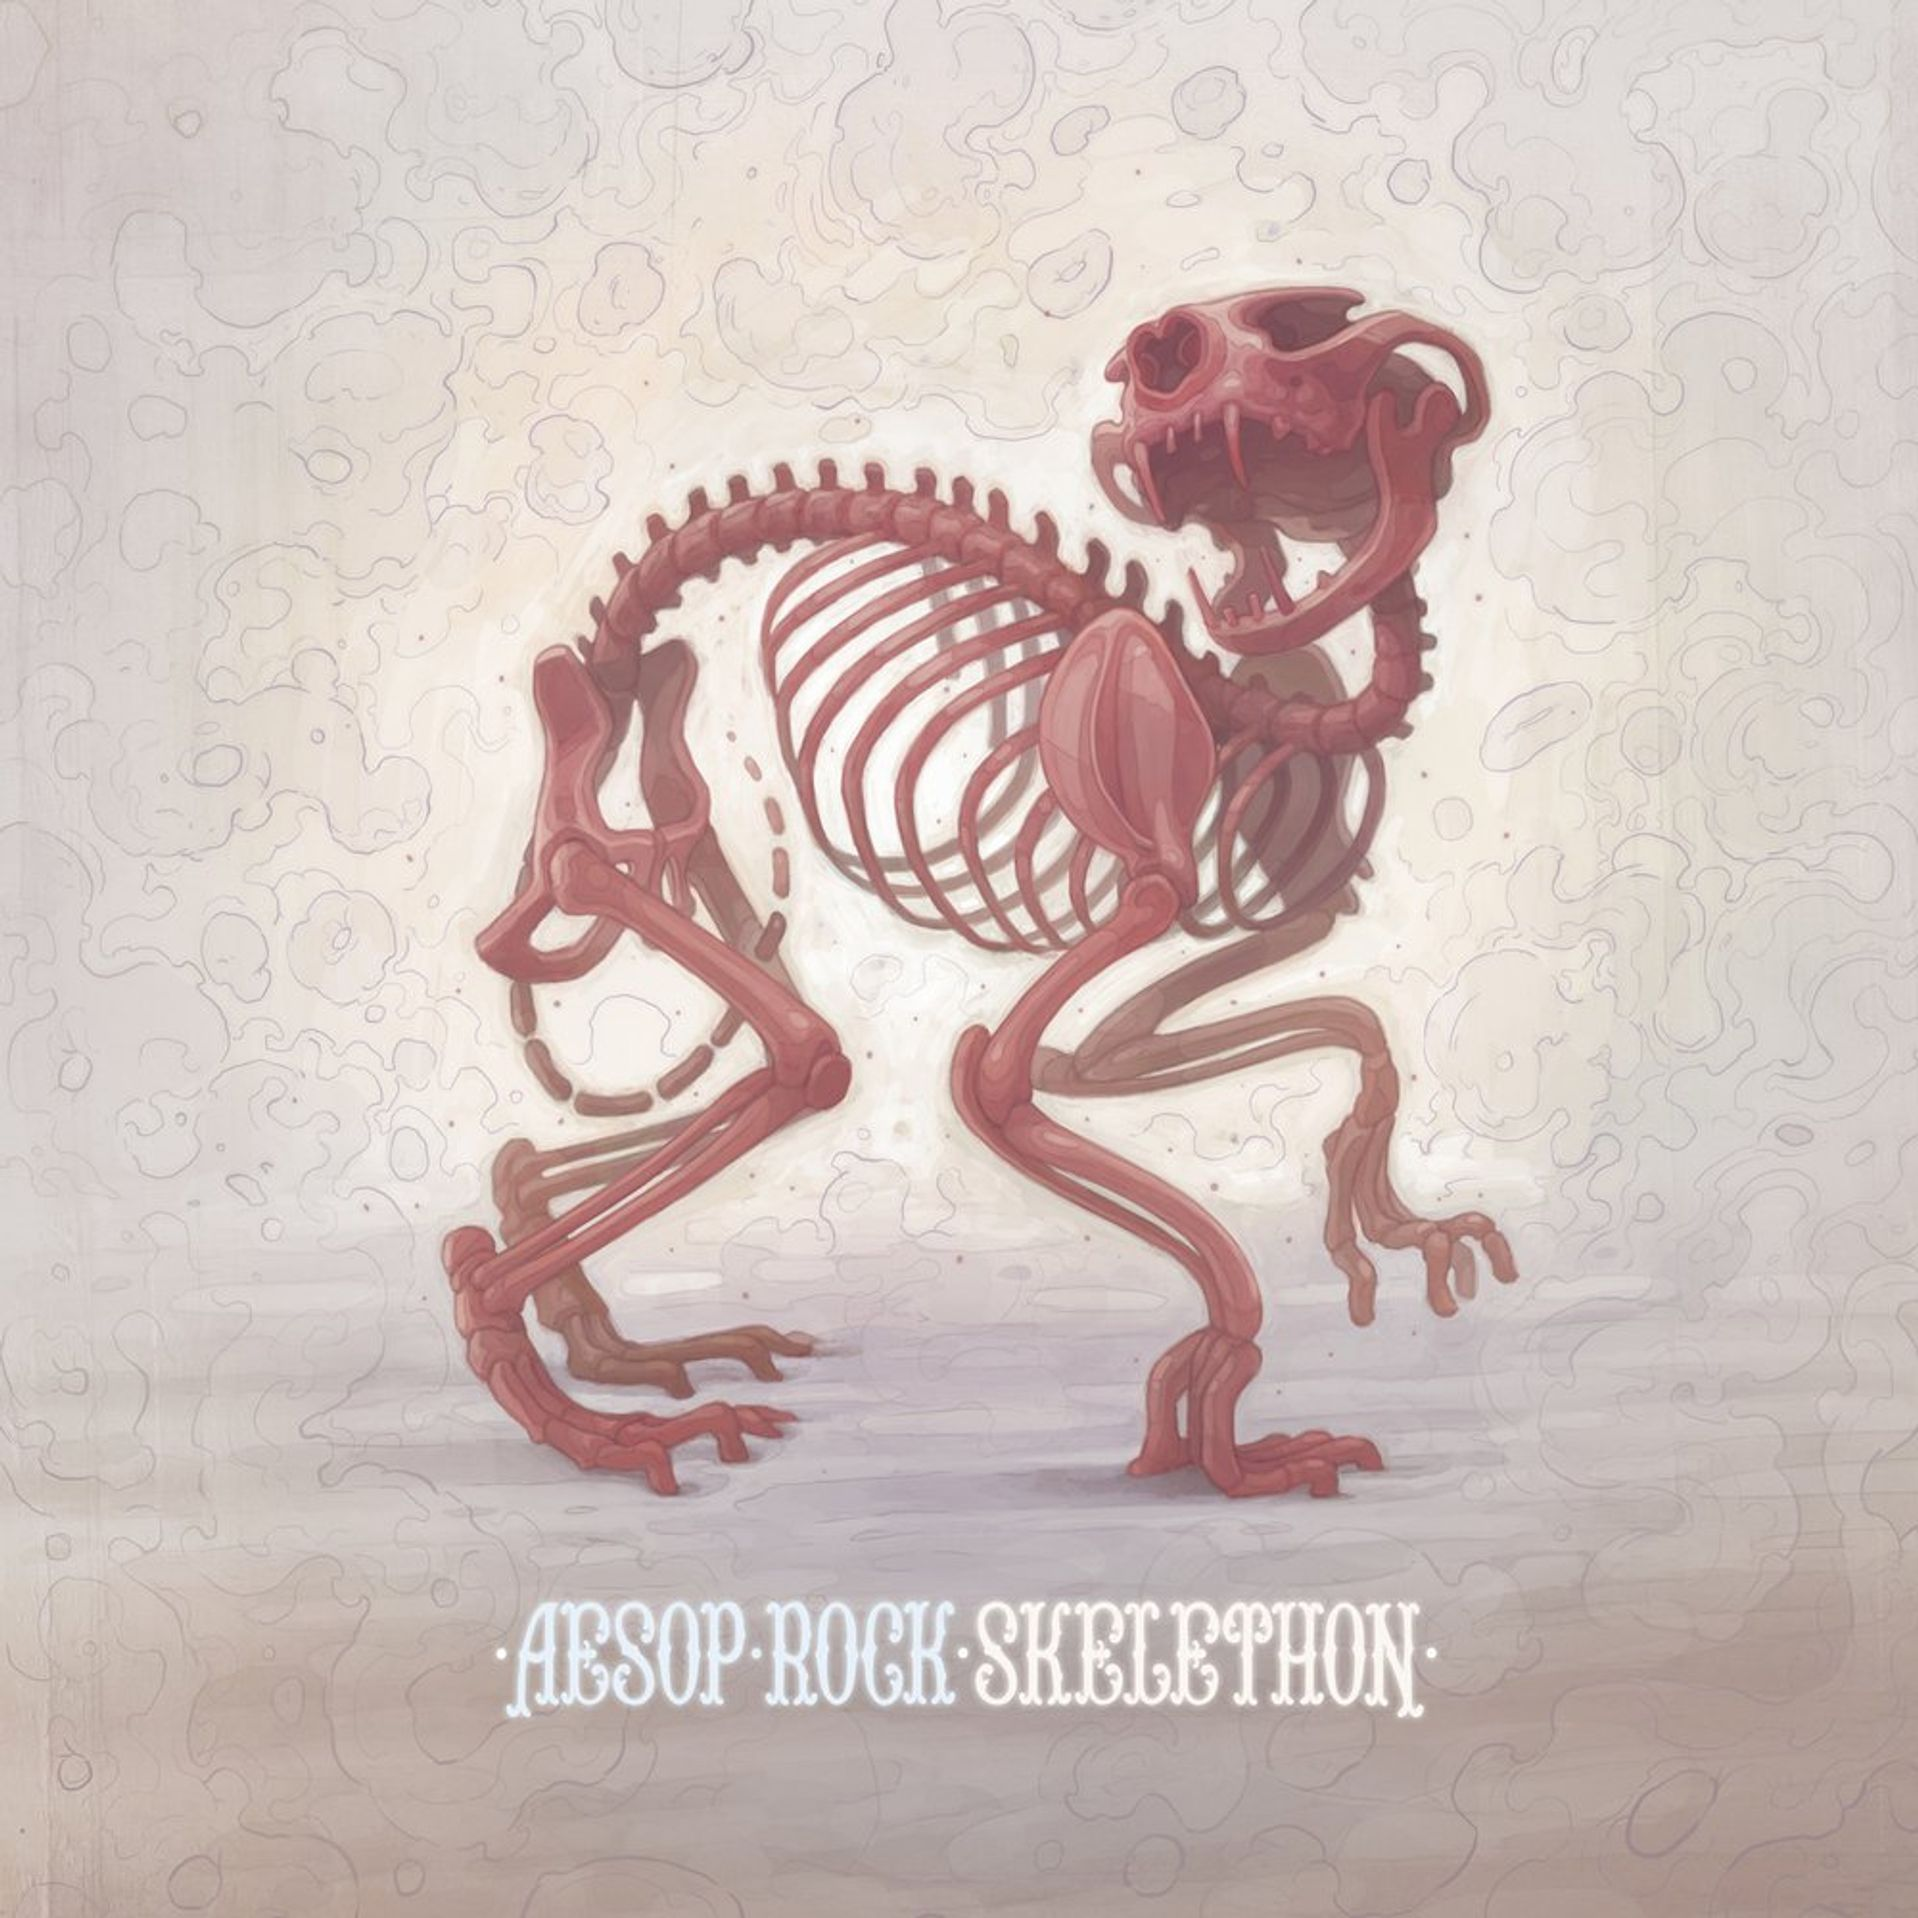 Album Title: Skelethon by: Aesop Rock